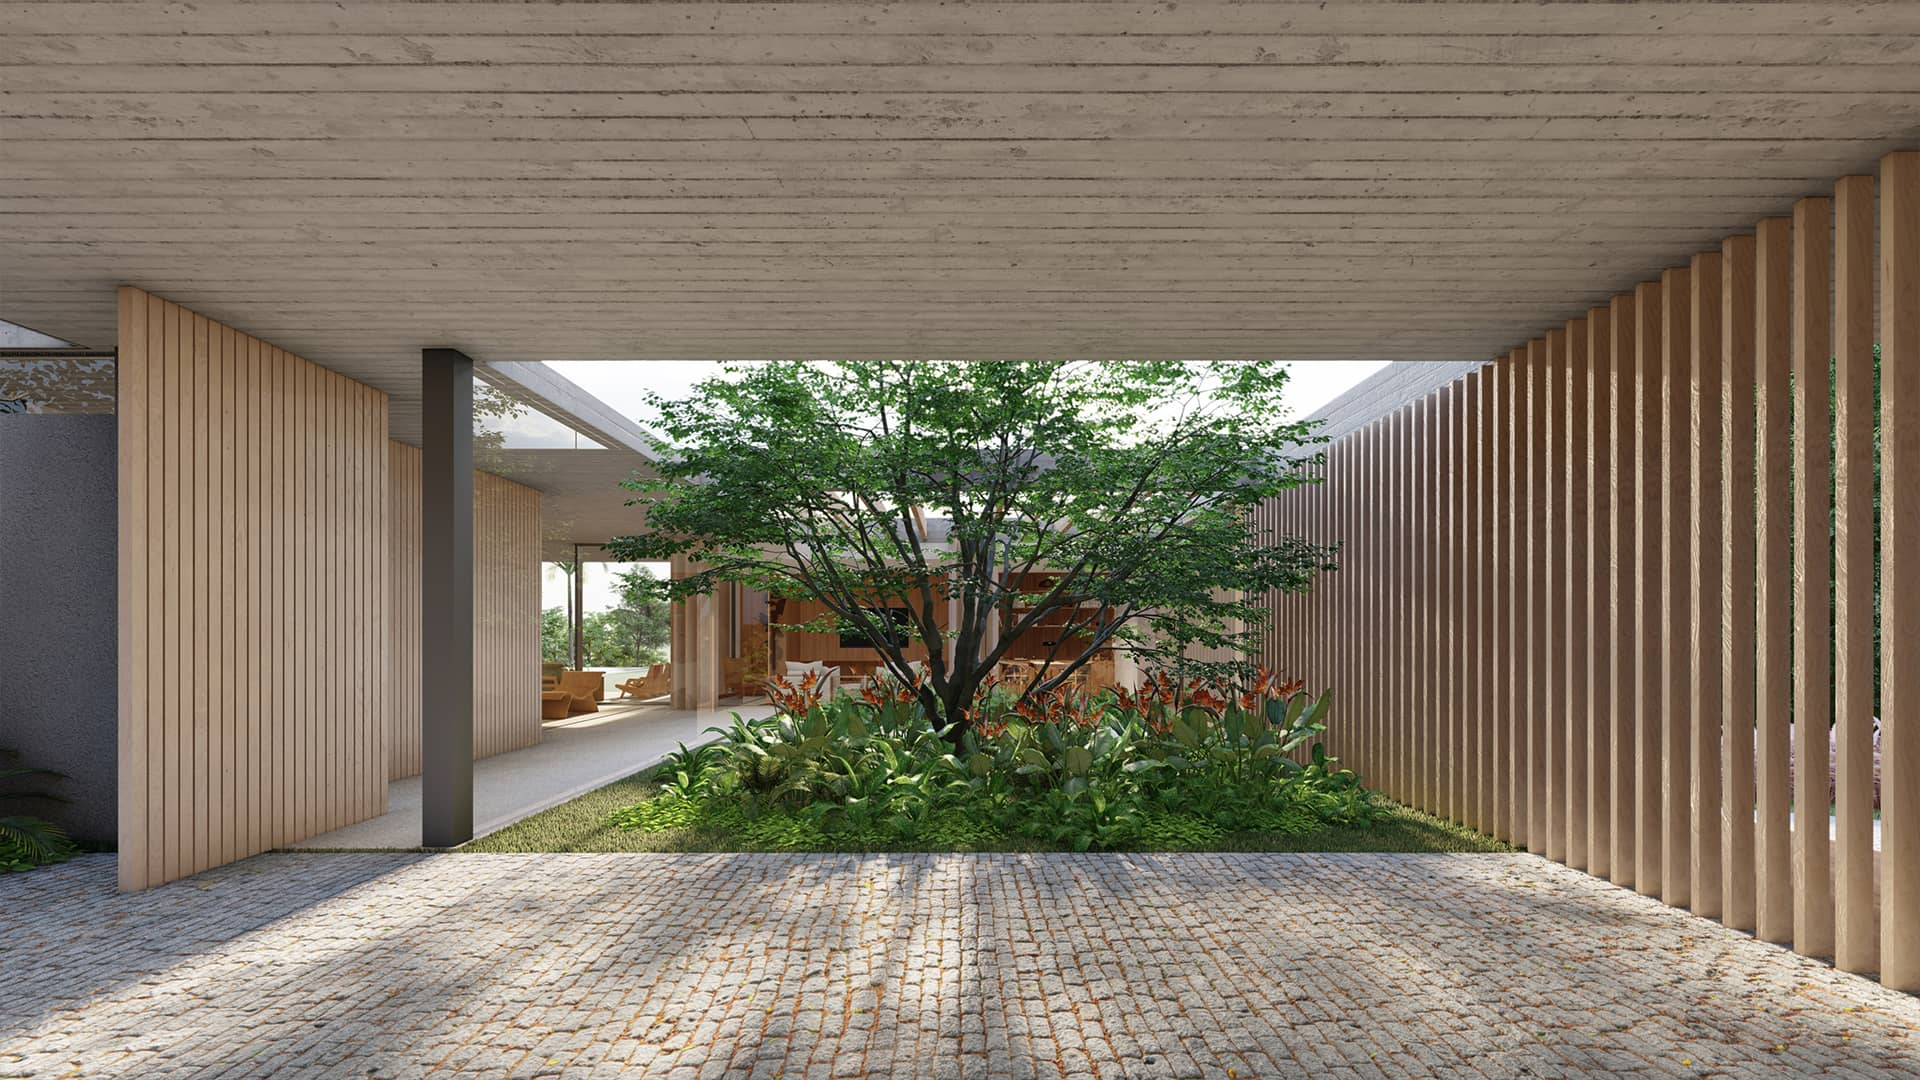 Sabella Arquitetura - Casa Concreto vista interna